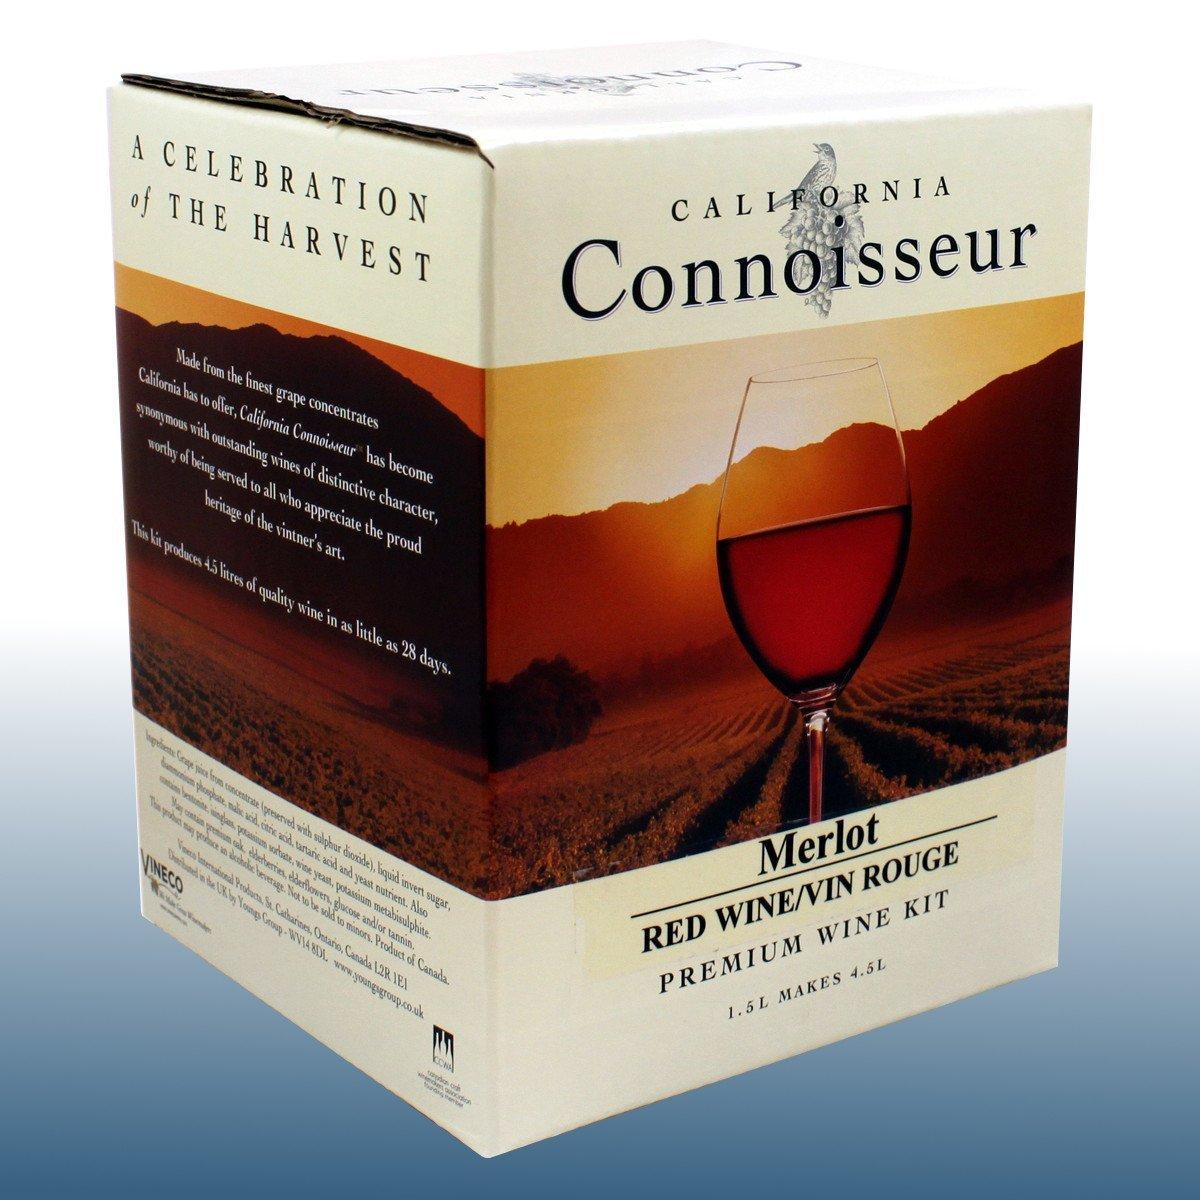 Home Brew & Wine Making - Red Wine Ingredient Kit - California Connoisseur - Merlot 6 Bottle Balliihoo Homebrew